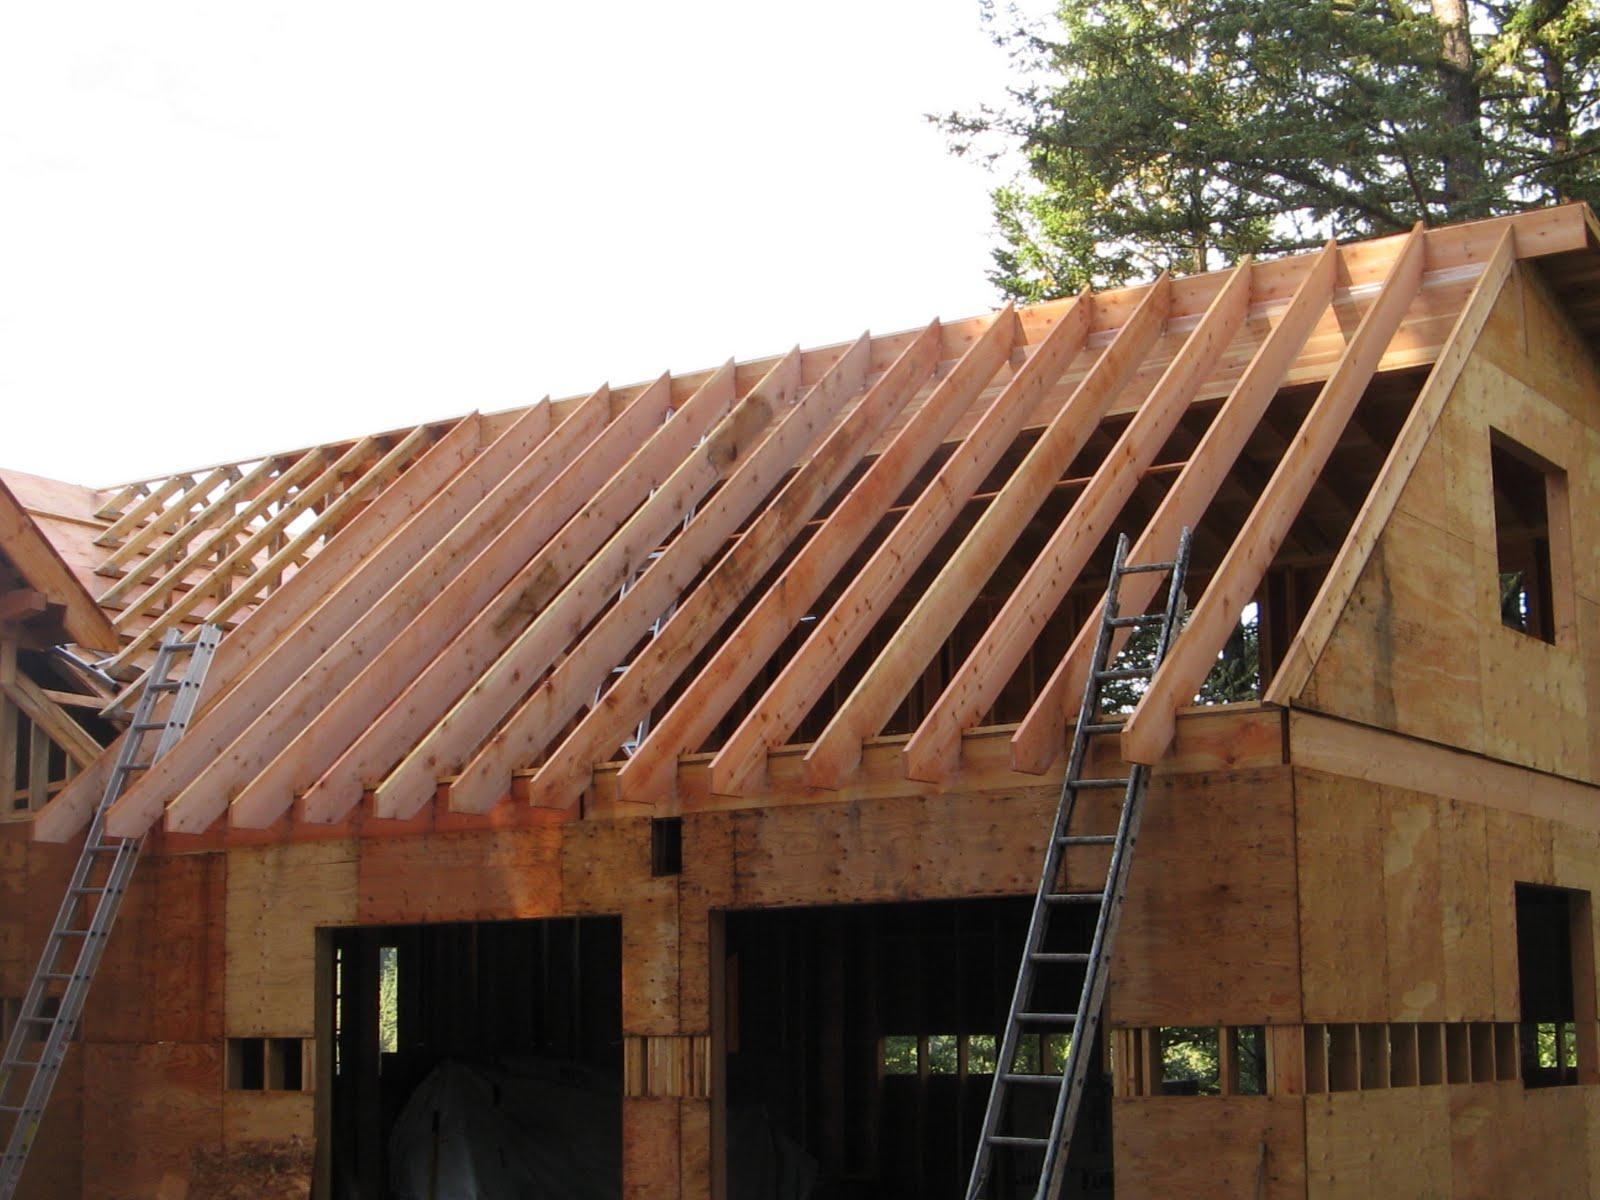 Lock Up To Finish Timberframe Diy Style September 2010